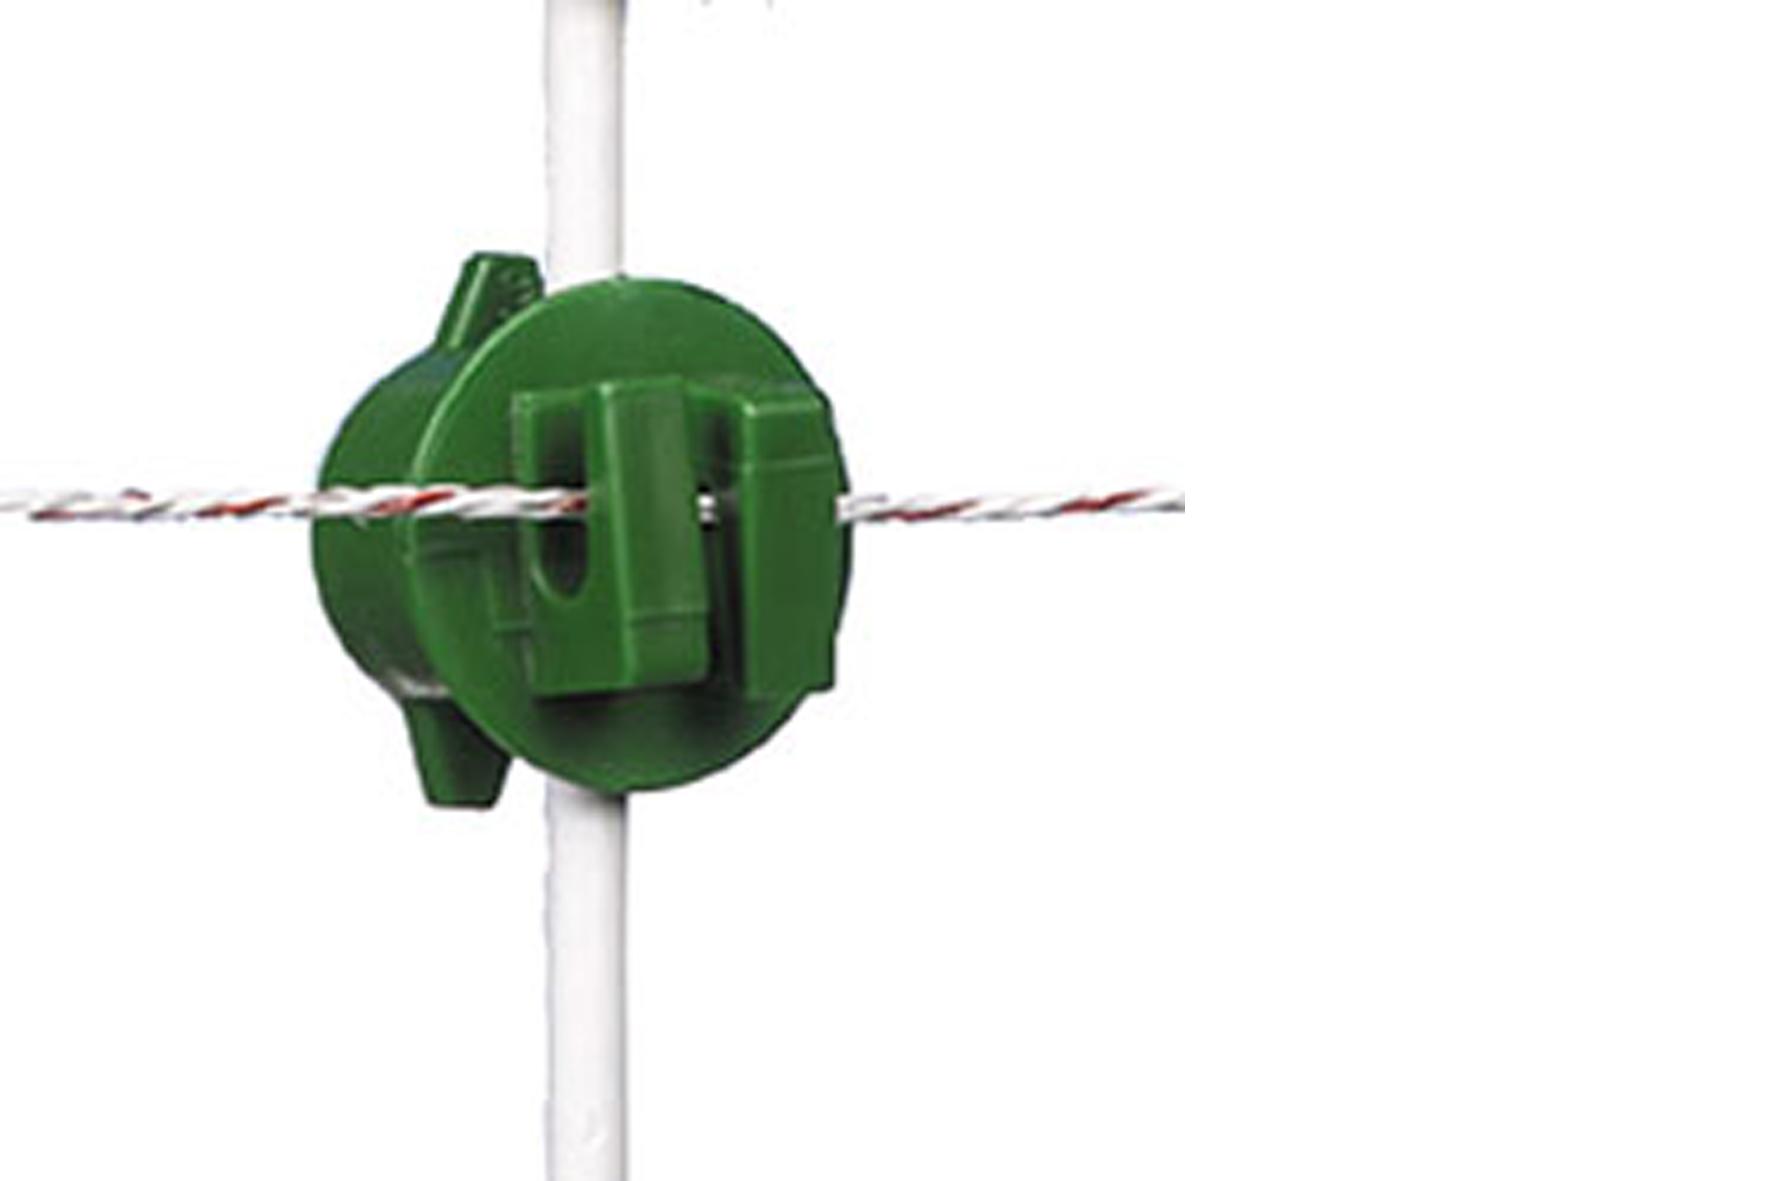 isolateur fer rond ecrou vert 6 14mm achat en ligne ou. Black Bedroom Furniture Sets. Home Design Ideas